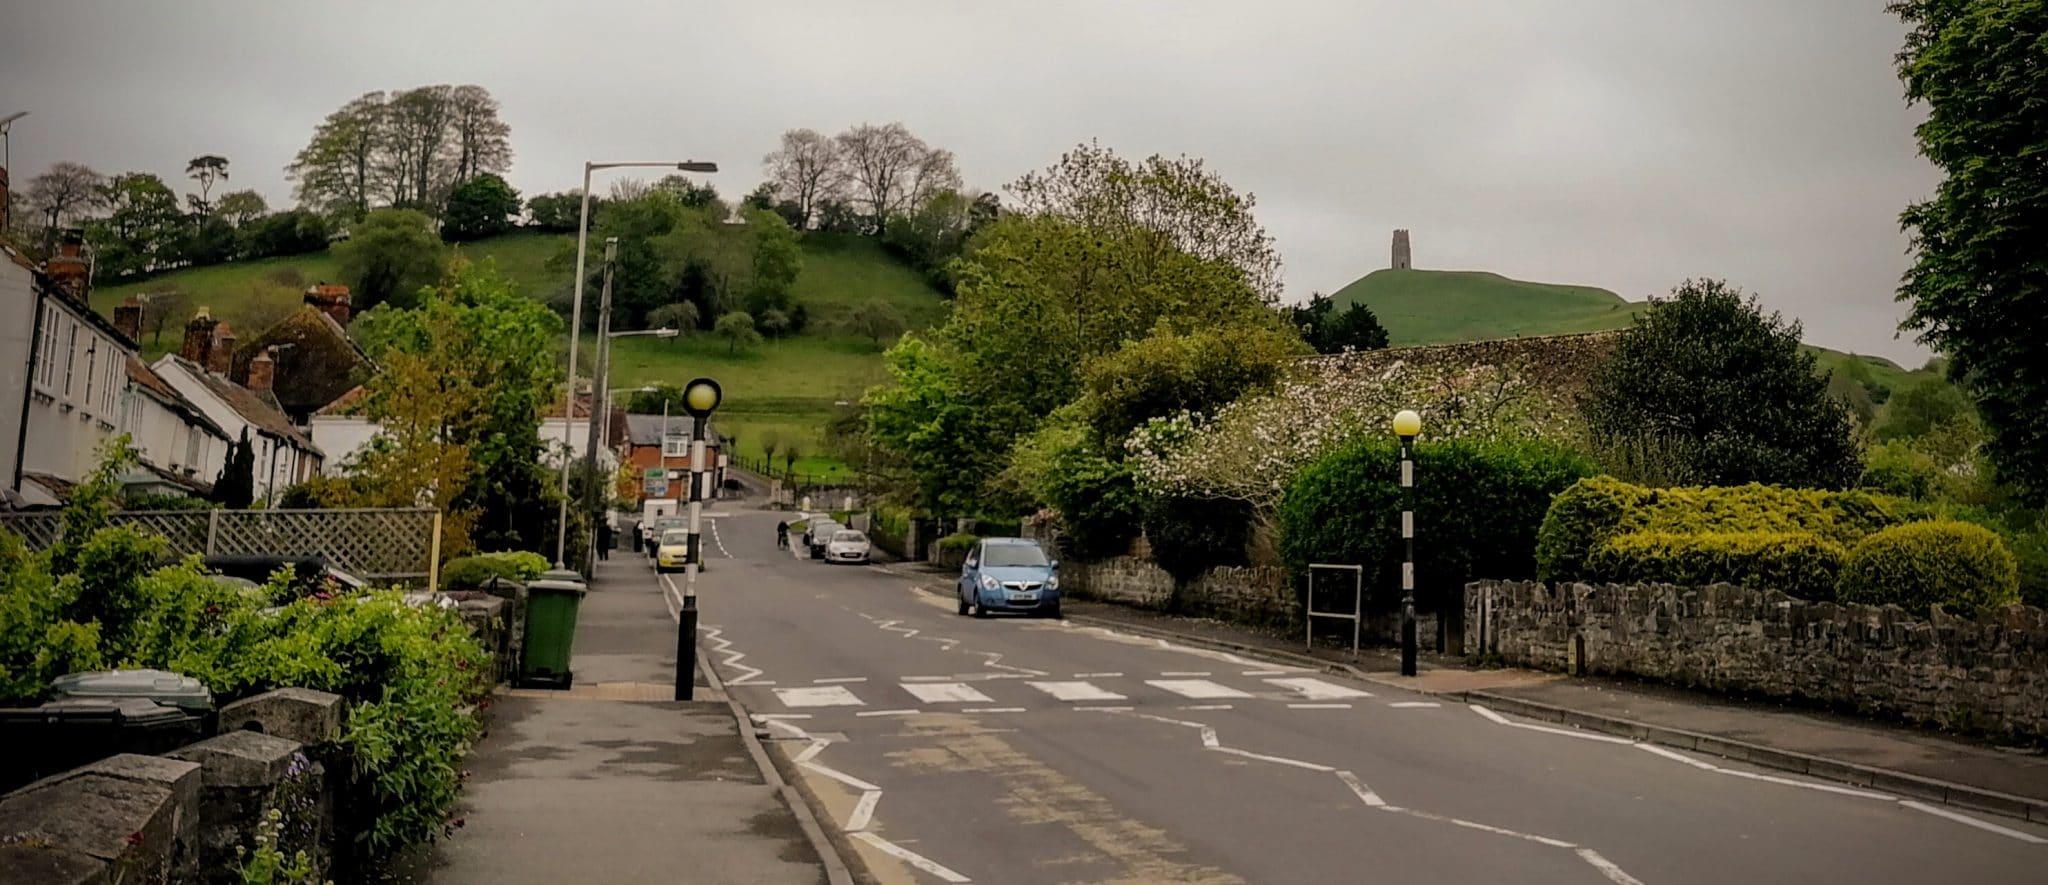 Glastonbury Tor from Bere Lane